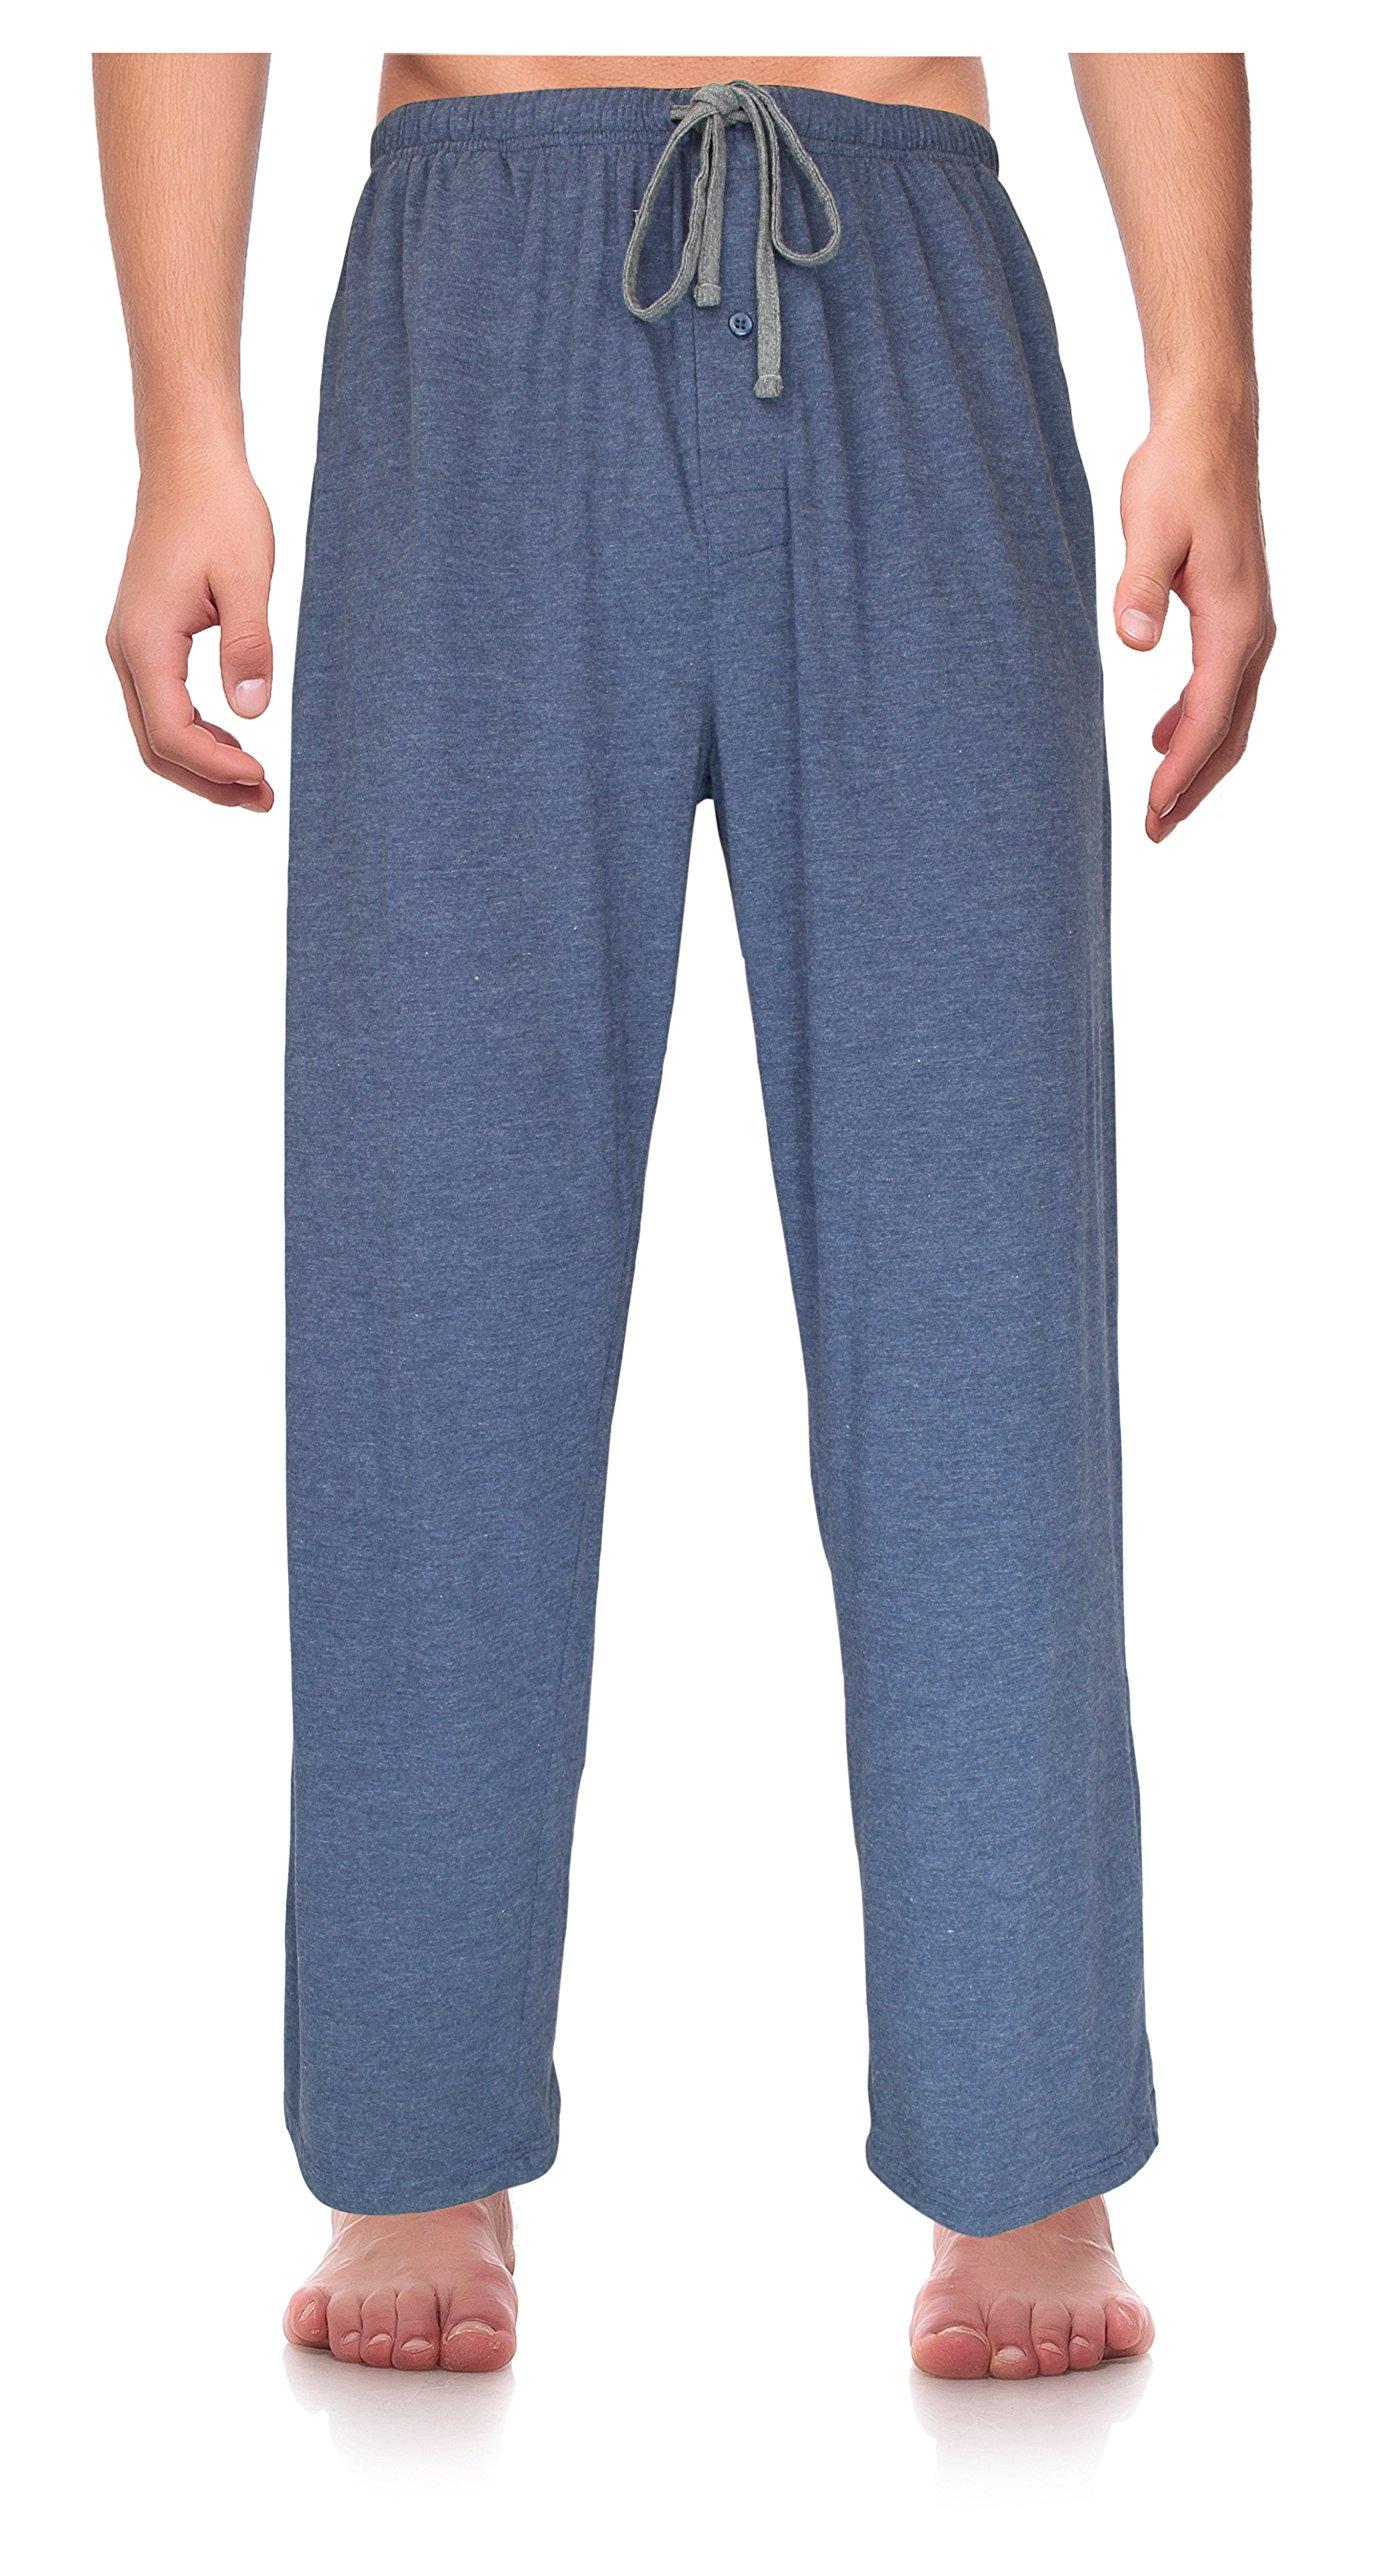 RK Classical Sleepwear Men's Knit Pajama Pants, Size Large Tall Blue